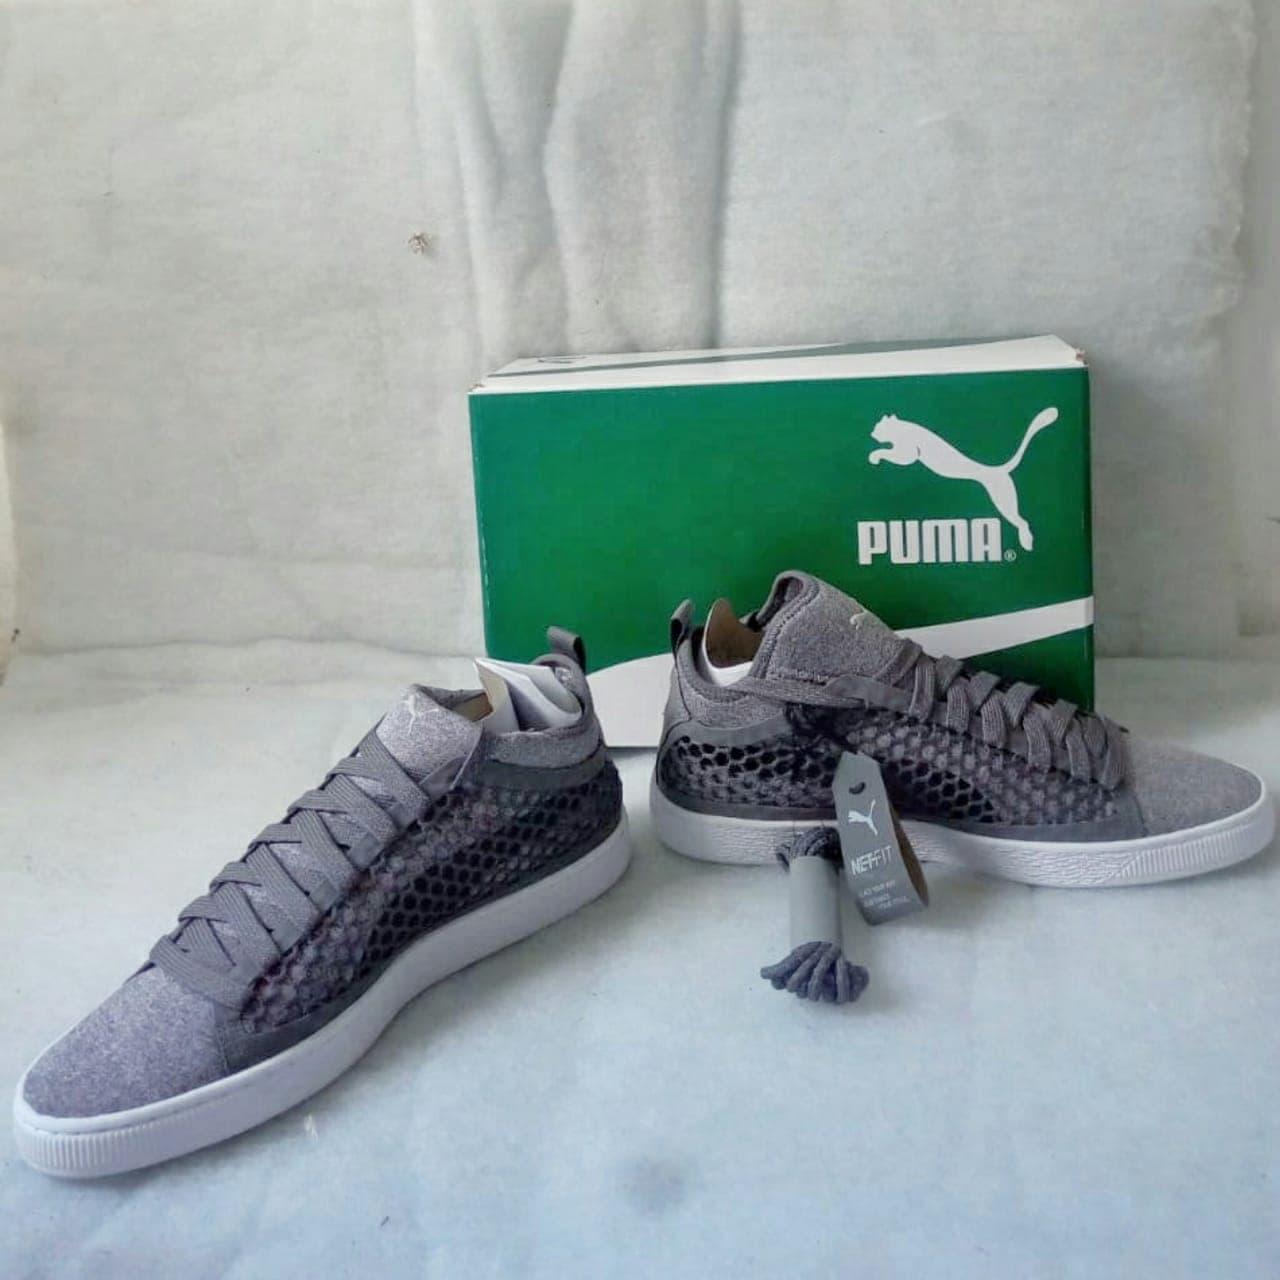 Sepatu Basket Puma Basket Classic Net Original BNIB for men size 41 ... d433f22db5